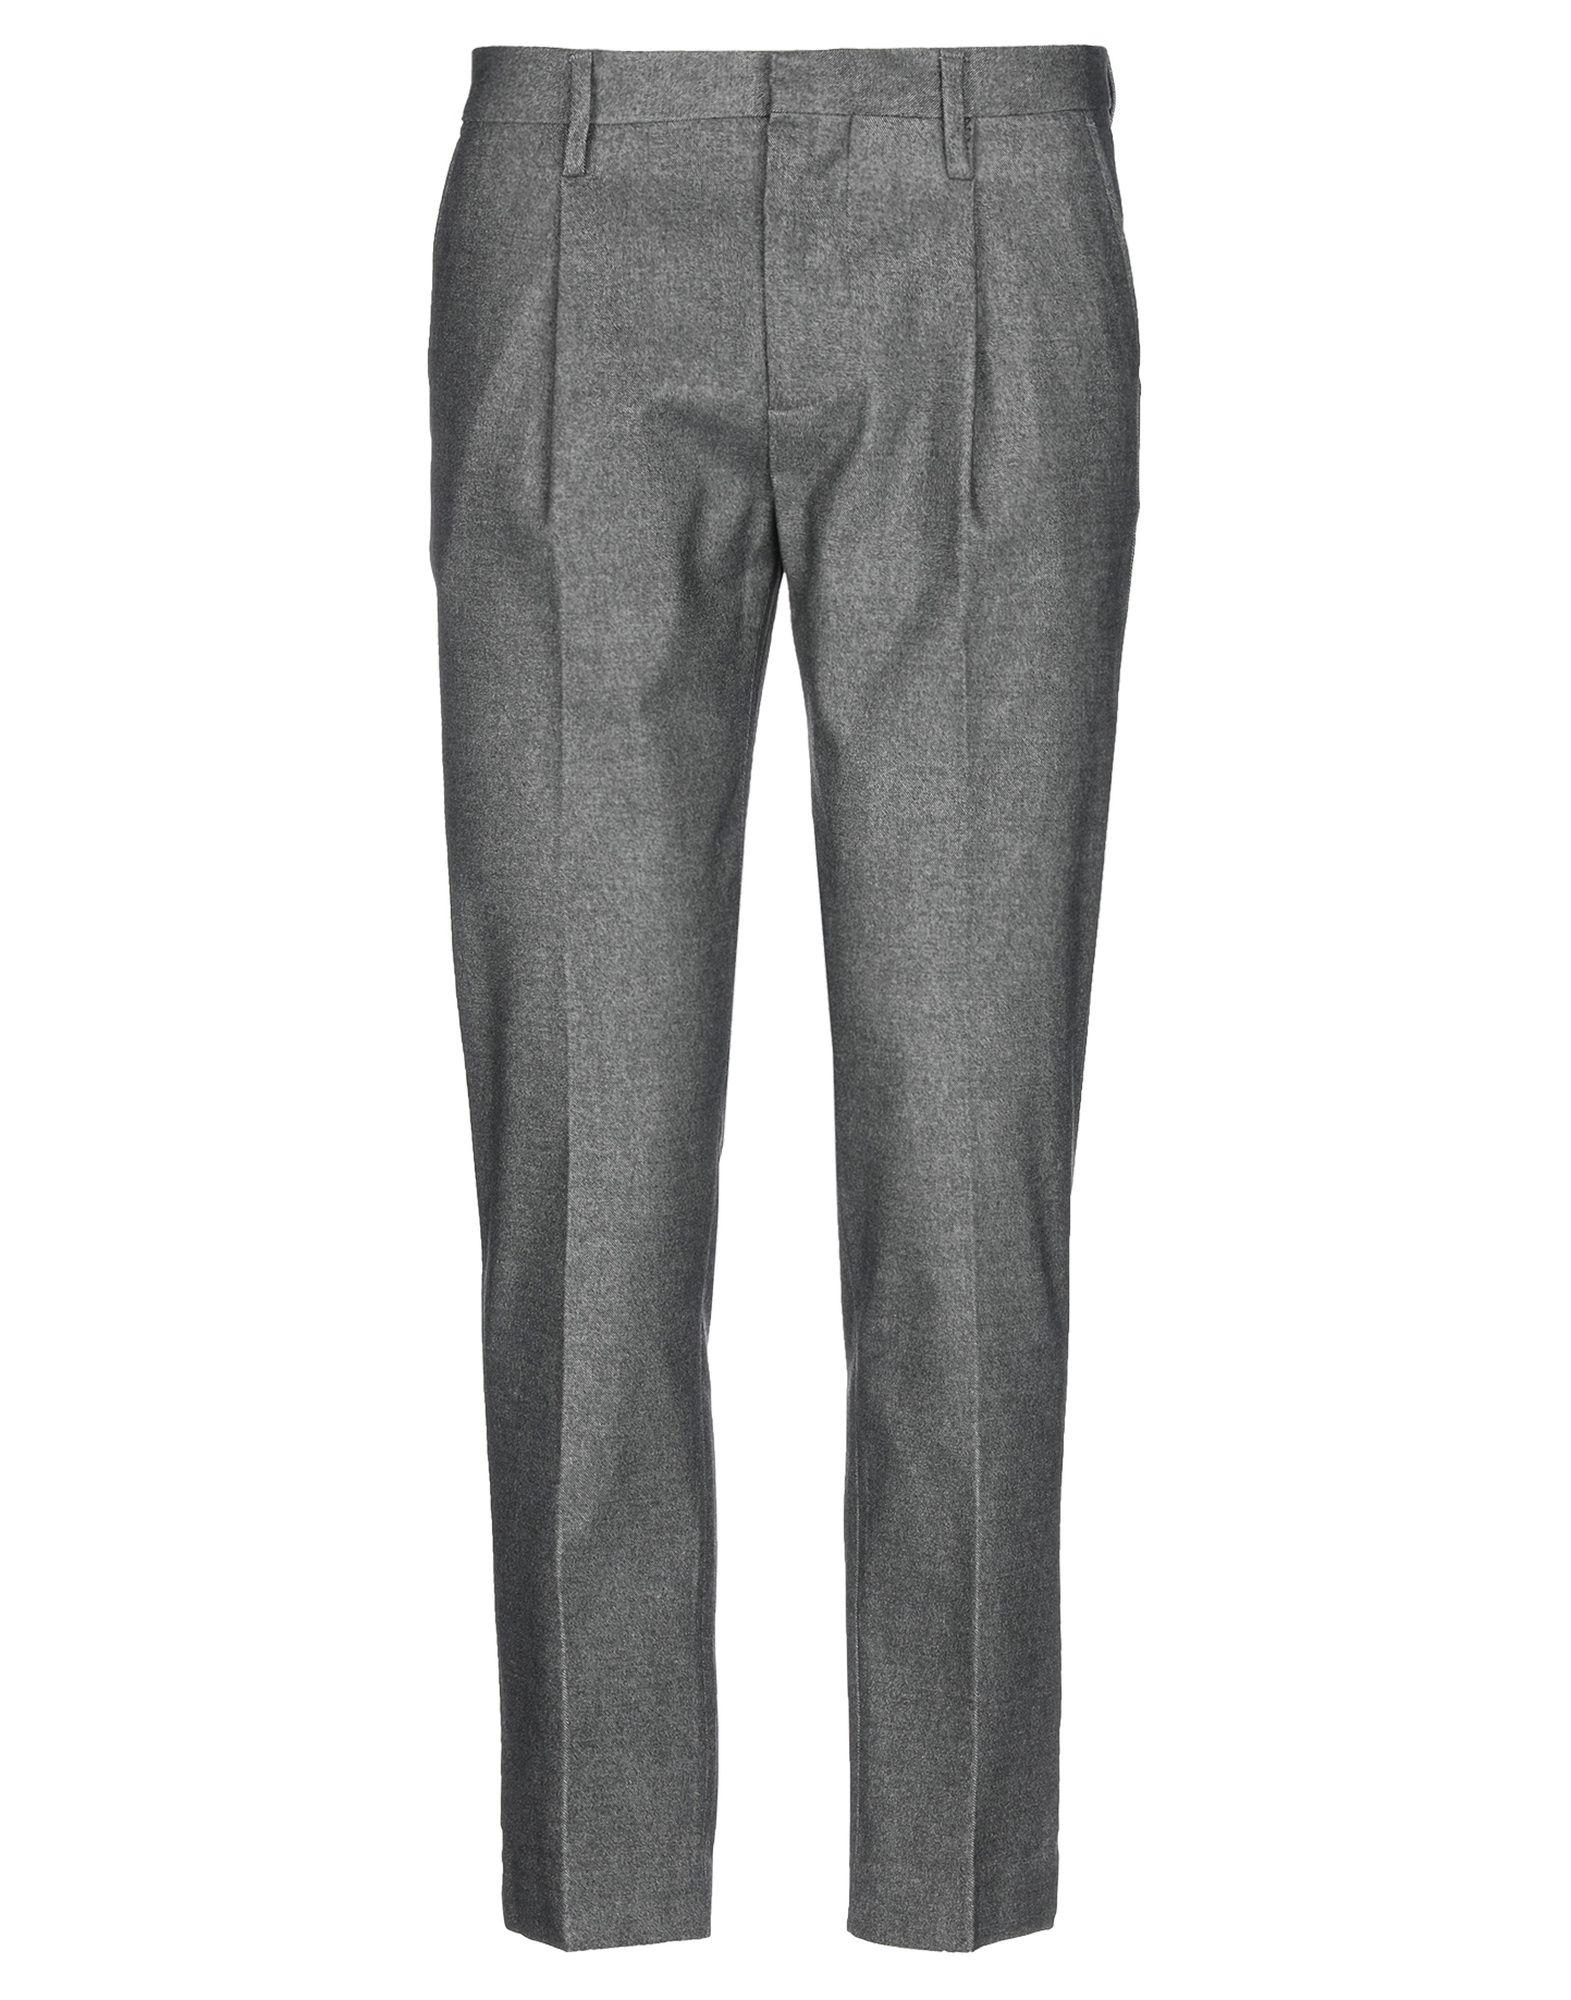 Pantalone Entre Amis herren - 13339061XL